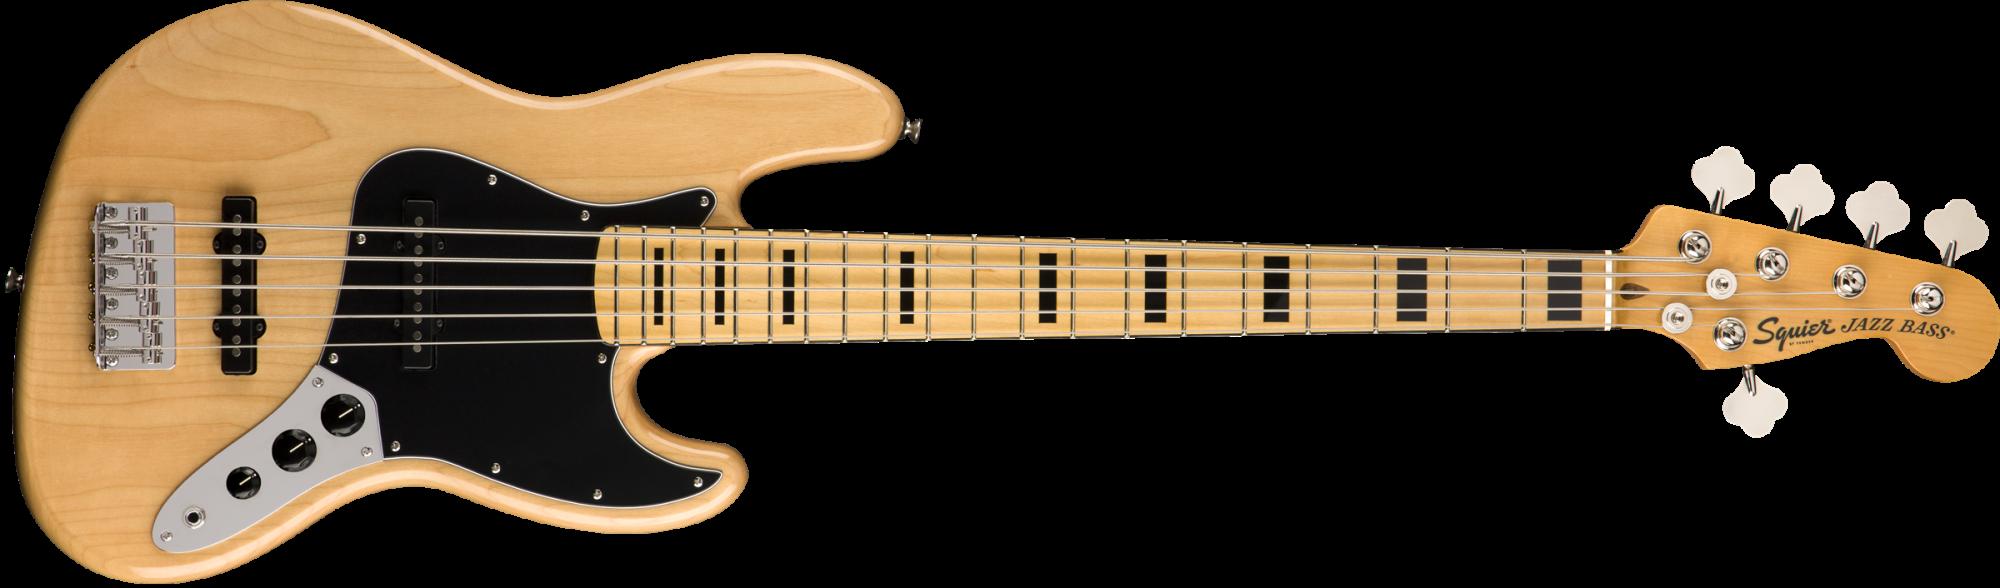 Squier Custom Vibe 70's Jazz Bass V MN NAT